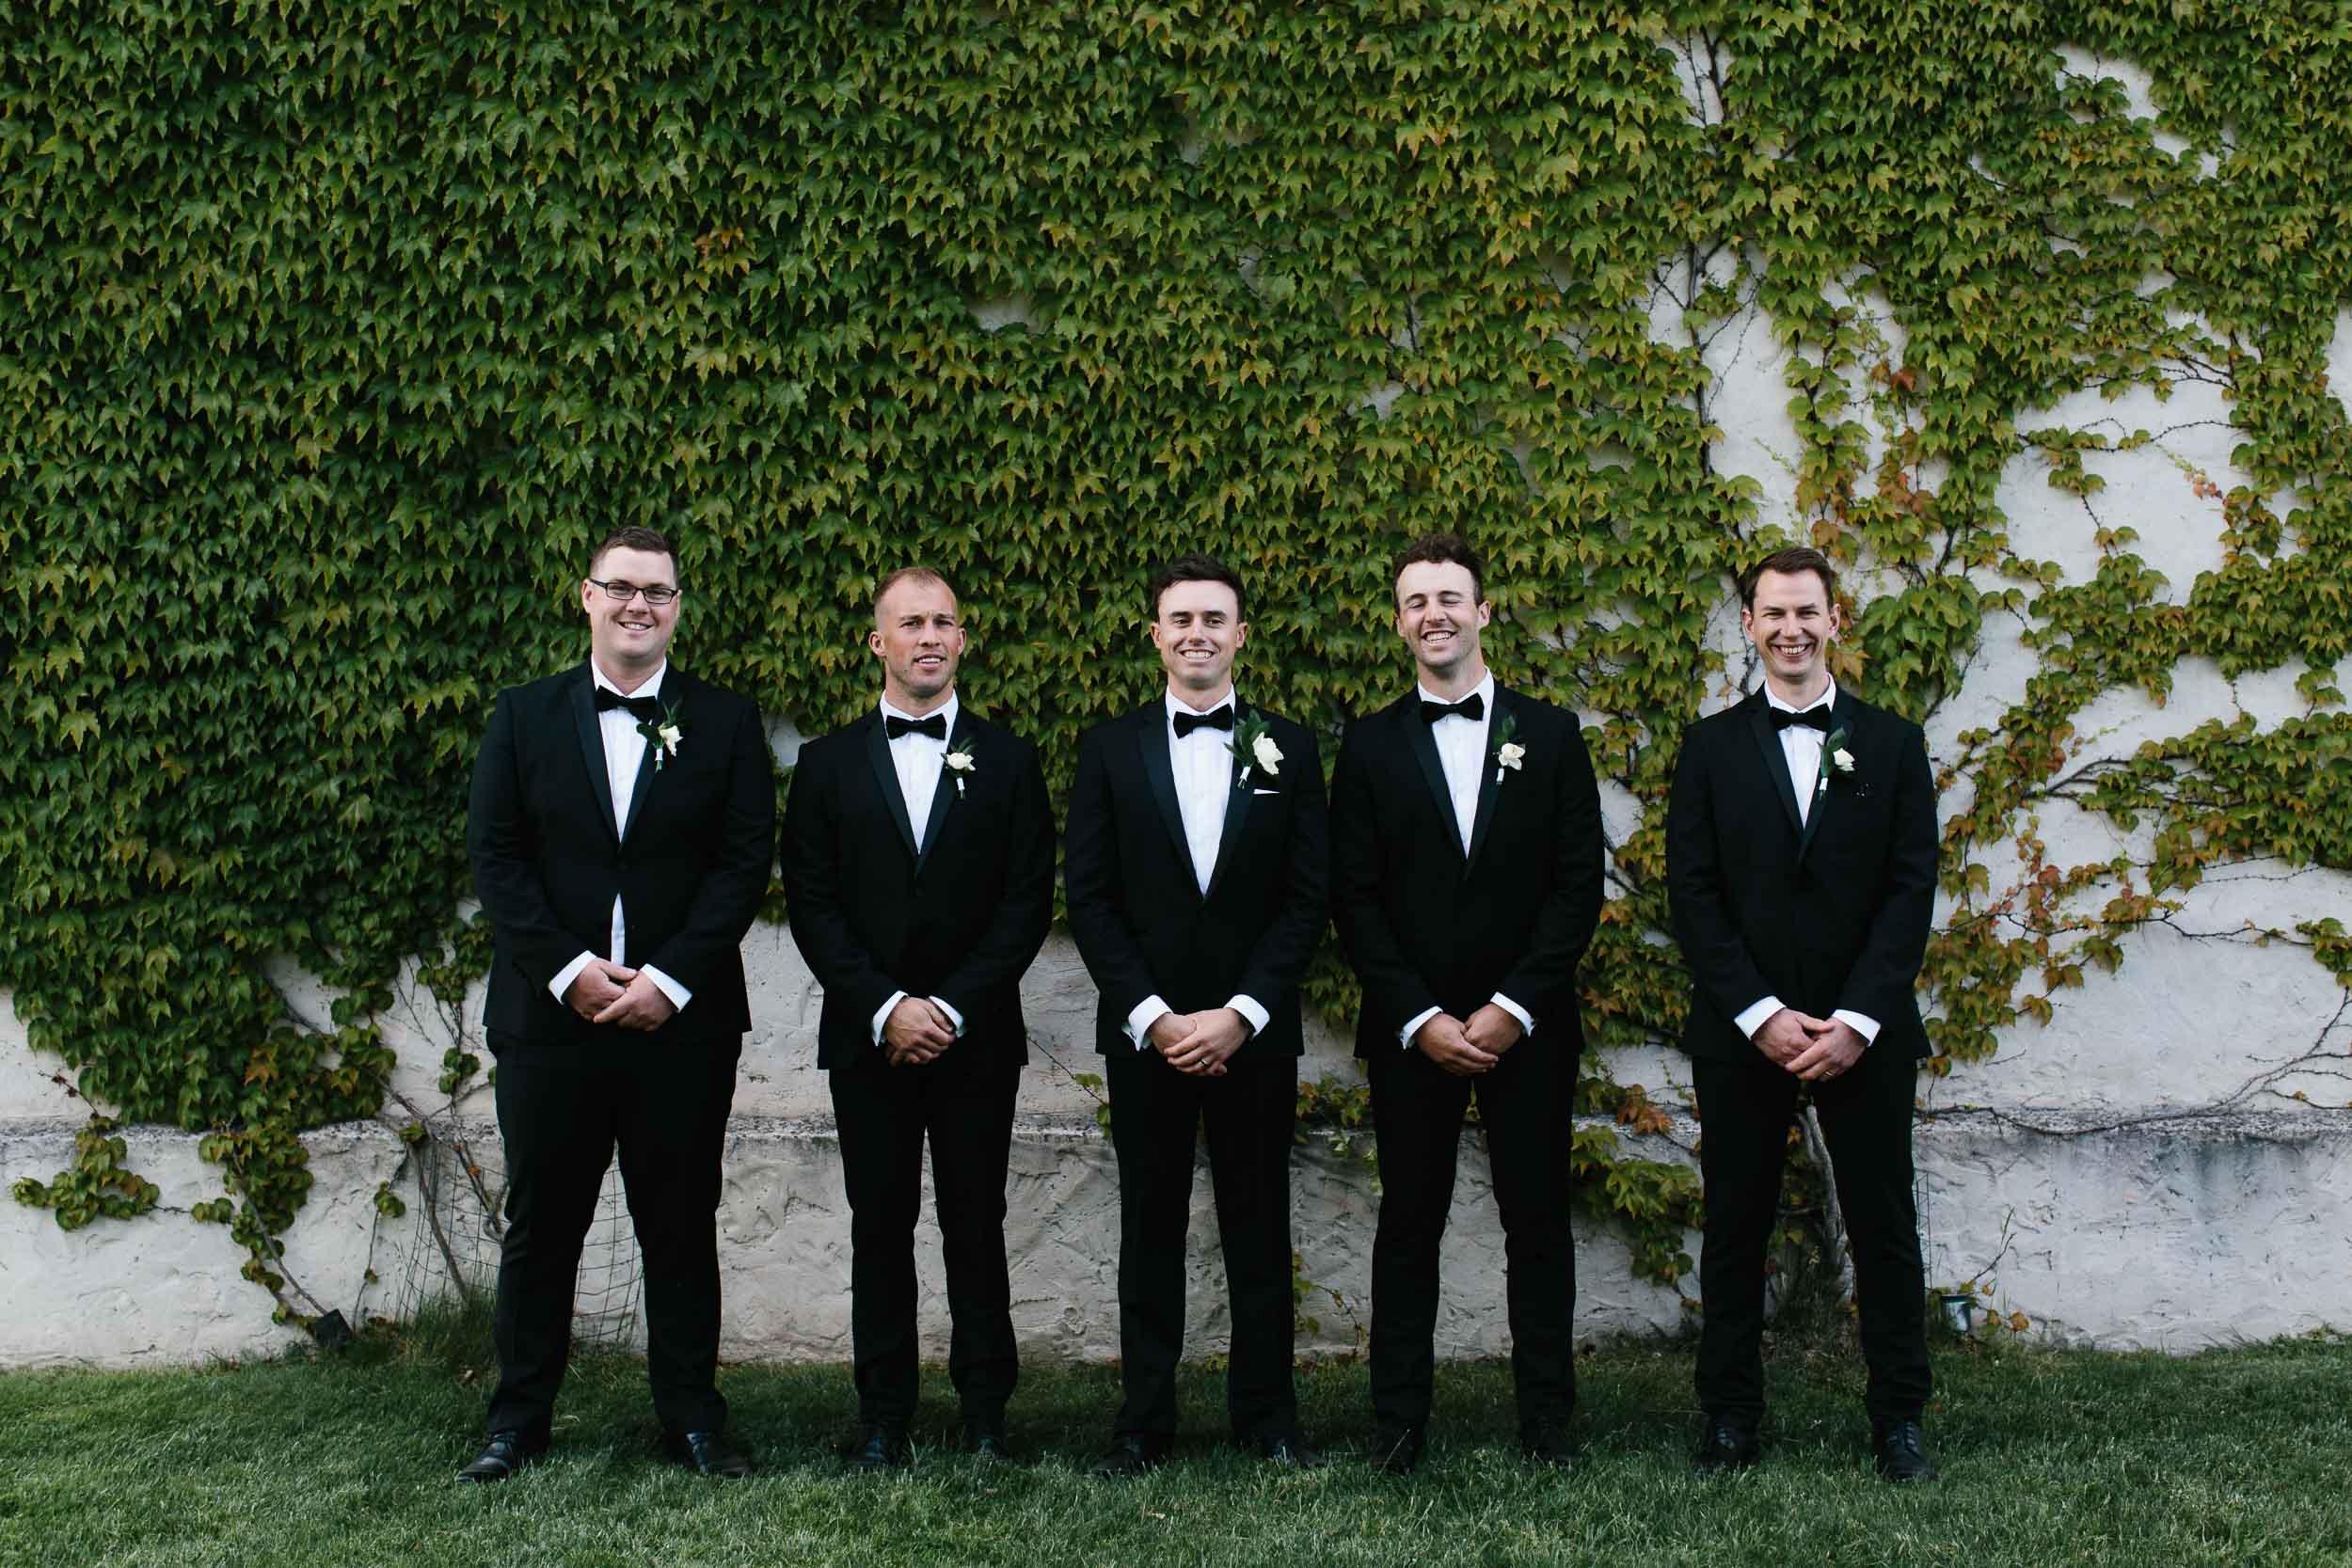 Kas-Richards-Stones-of-the-Yarra-Valley-Wedding-542.jpg